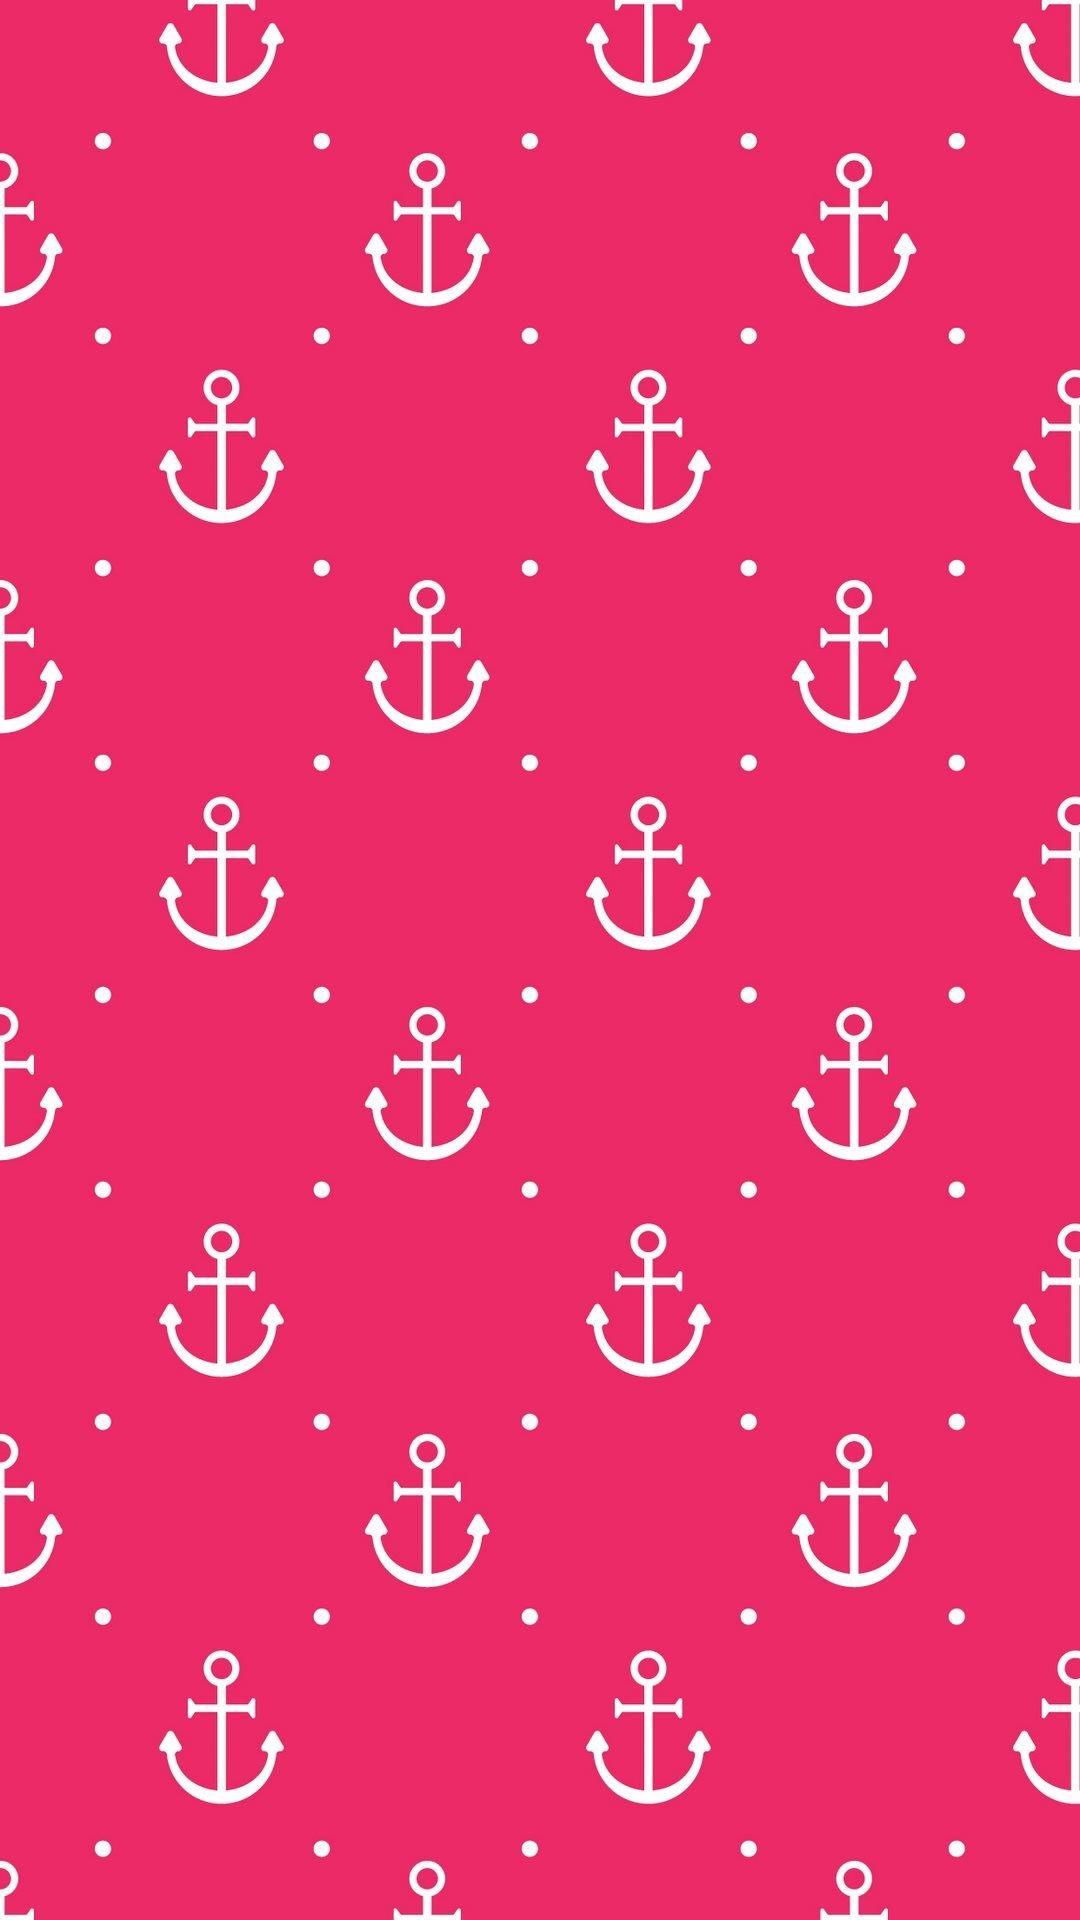 Anchor iPhone 6 wallpaper